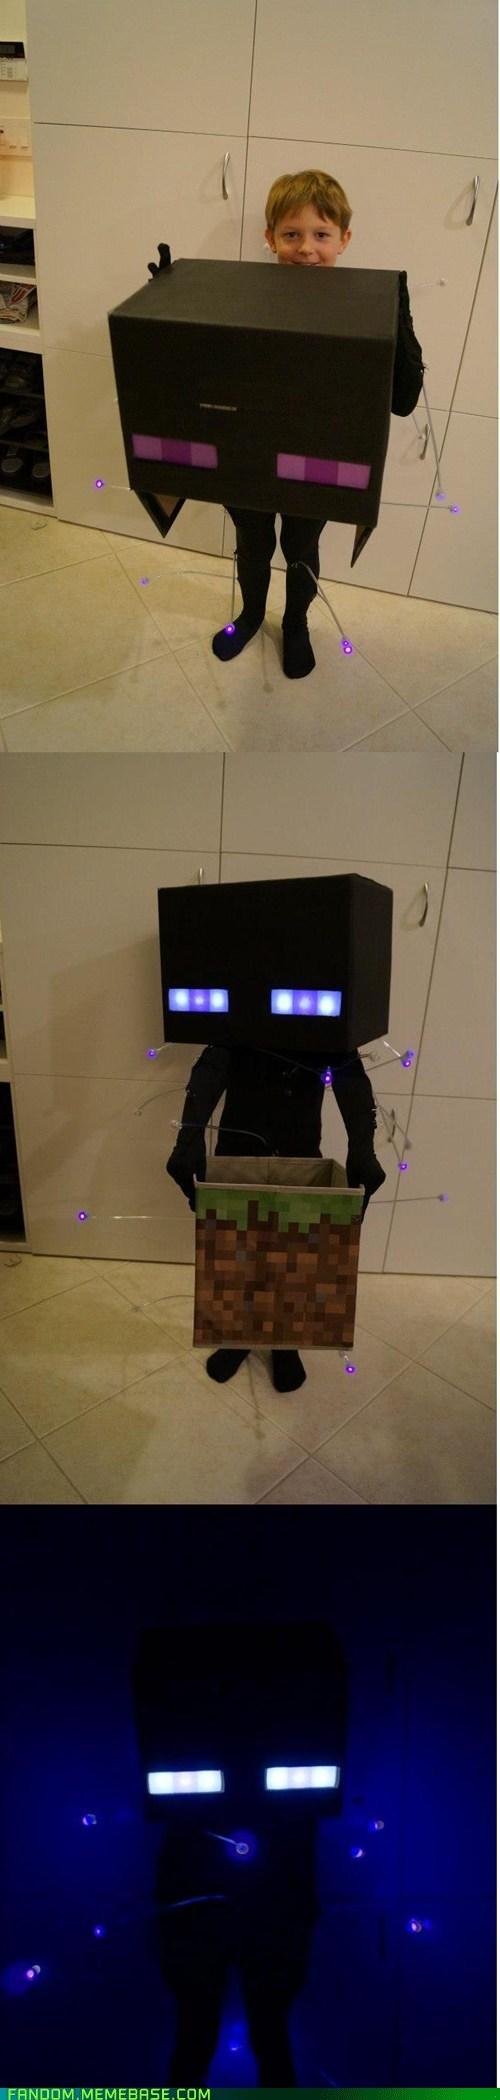 cosplay kids cute minecraft video games - 6971160832